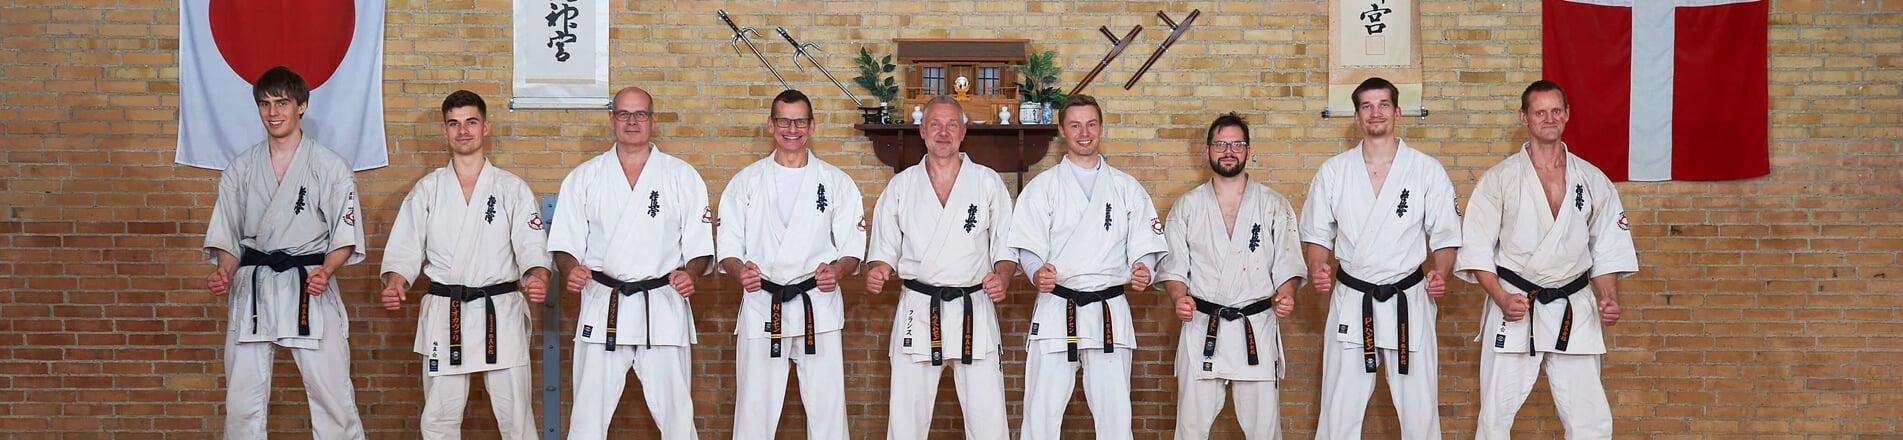 Farum Kyokushin Karate - Instruktørene